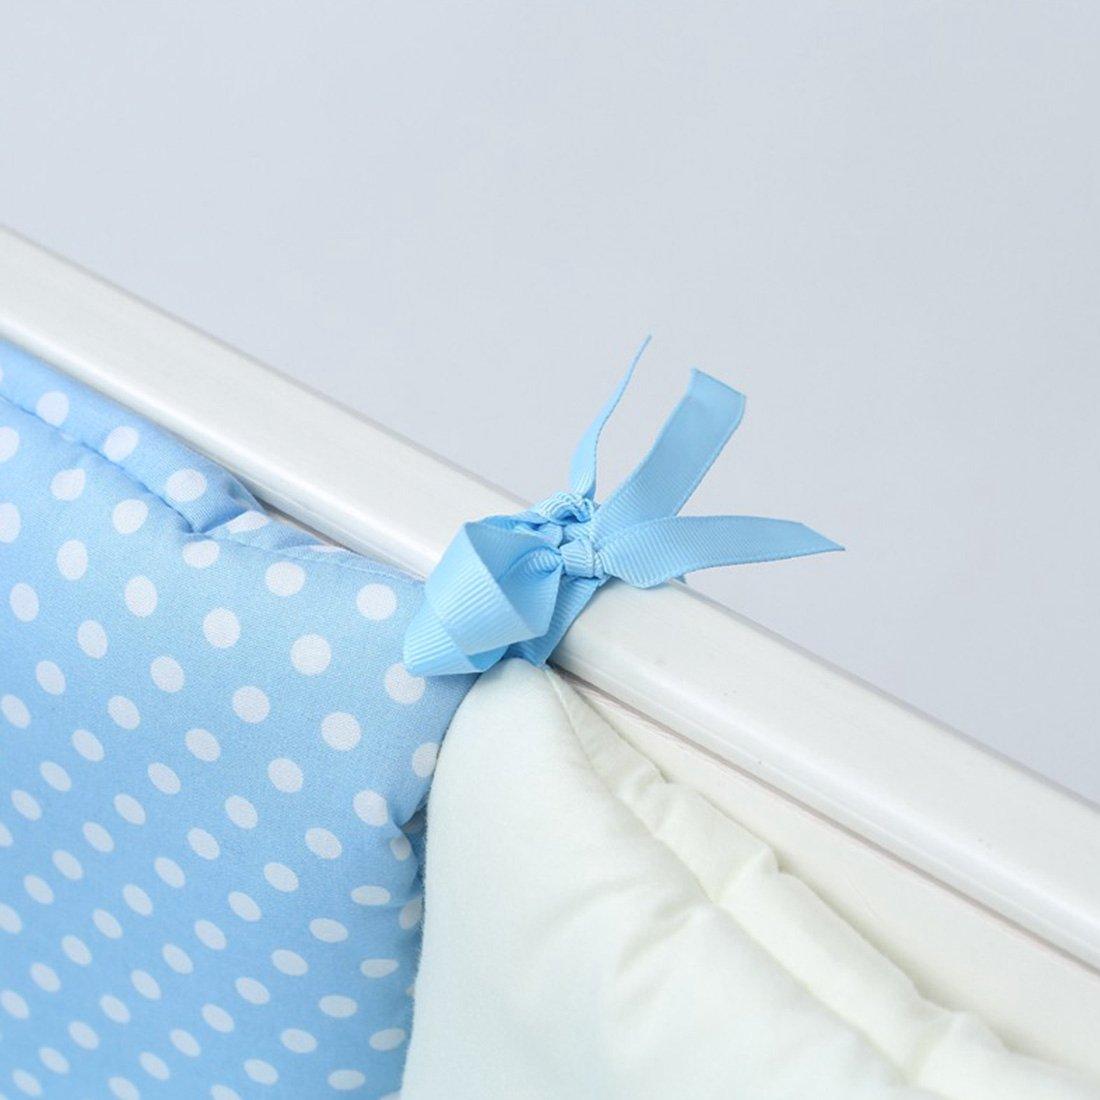 Giraffe 30cm Qianle 6pcs Baby Cot Bed Bumper Breathable Nursery Bedding Set 30